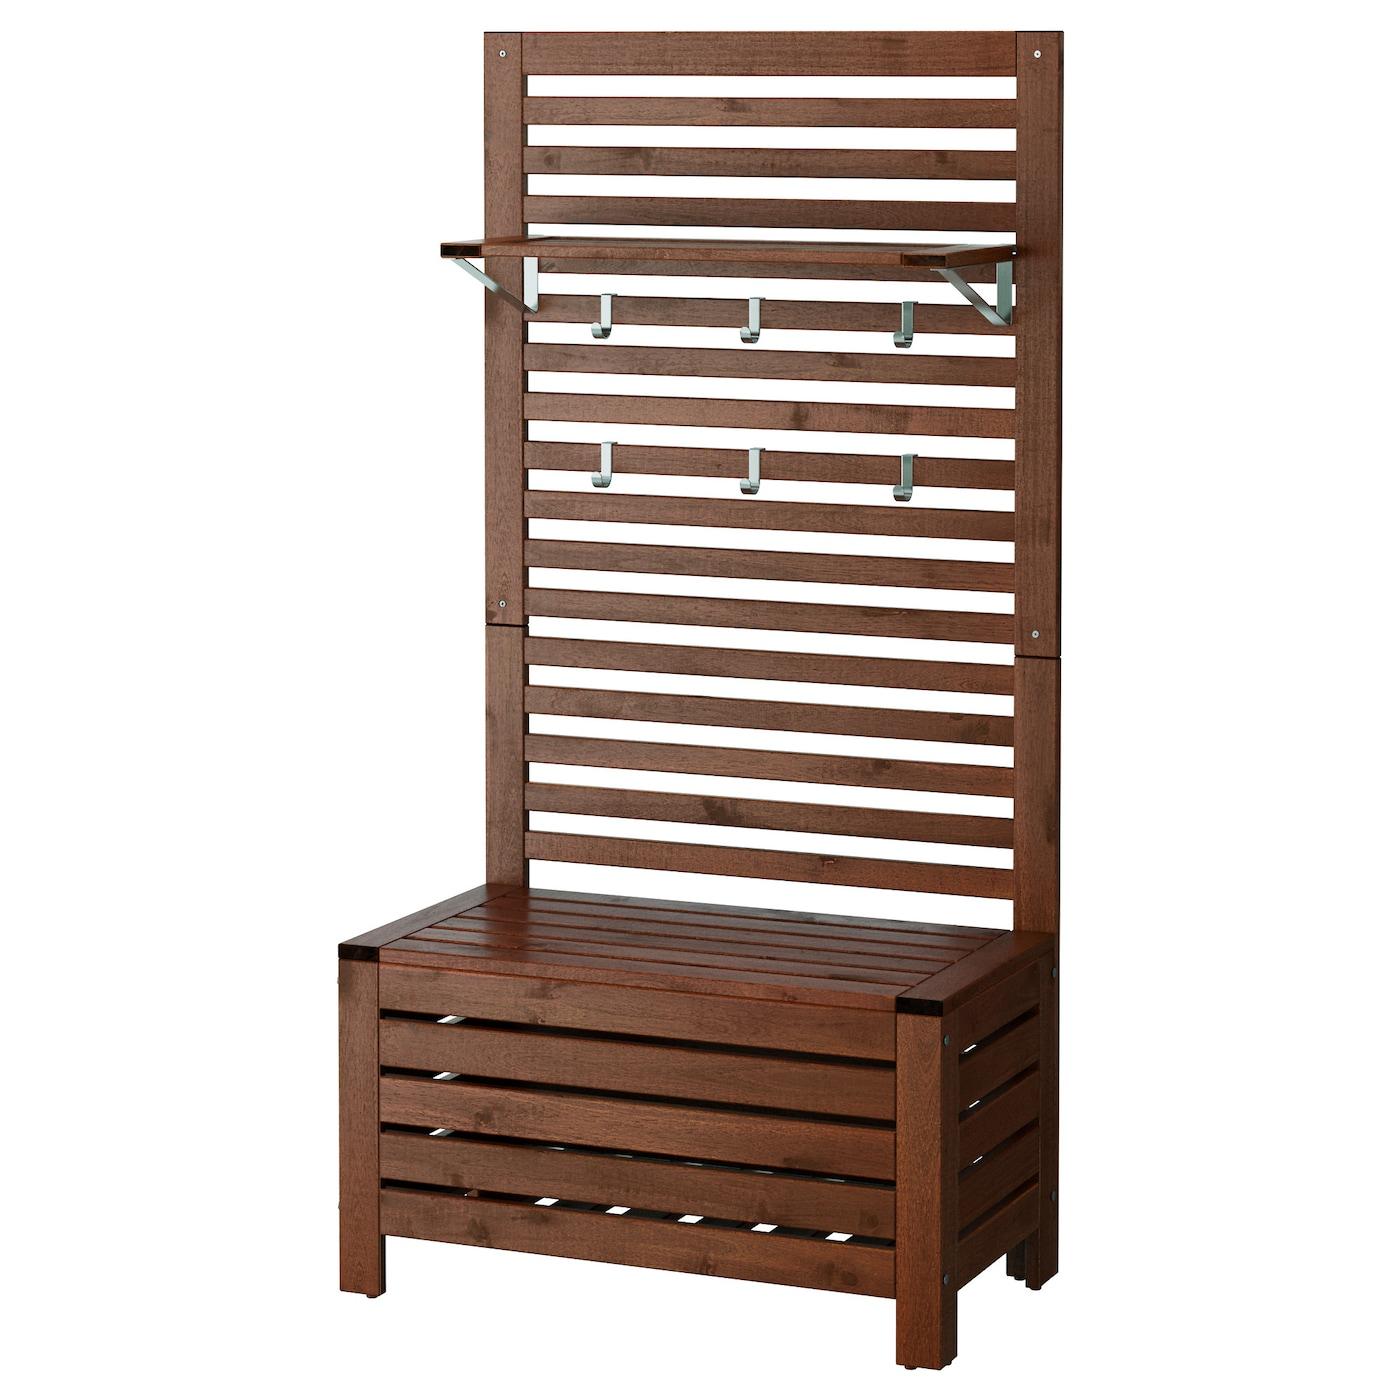 Mensole In Legno Ikea ÄpplarÖ bench w wall panel+ shelf, outdoor - brown stained 80x44x158 cm